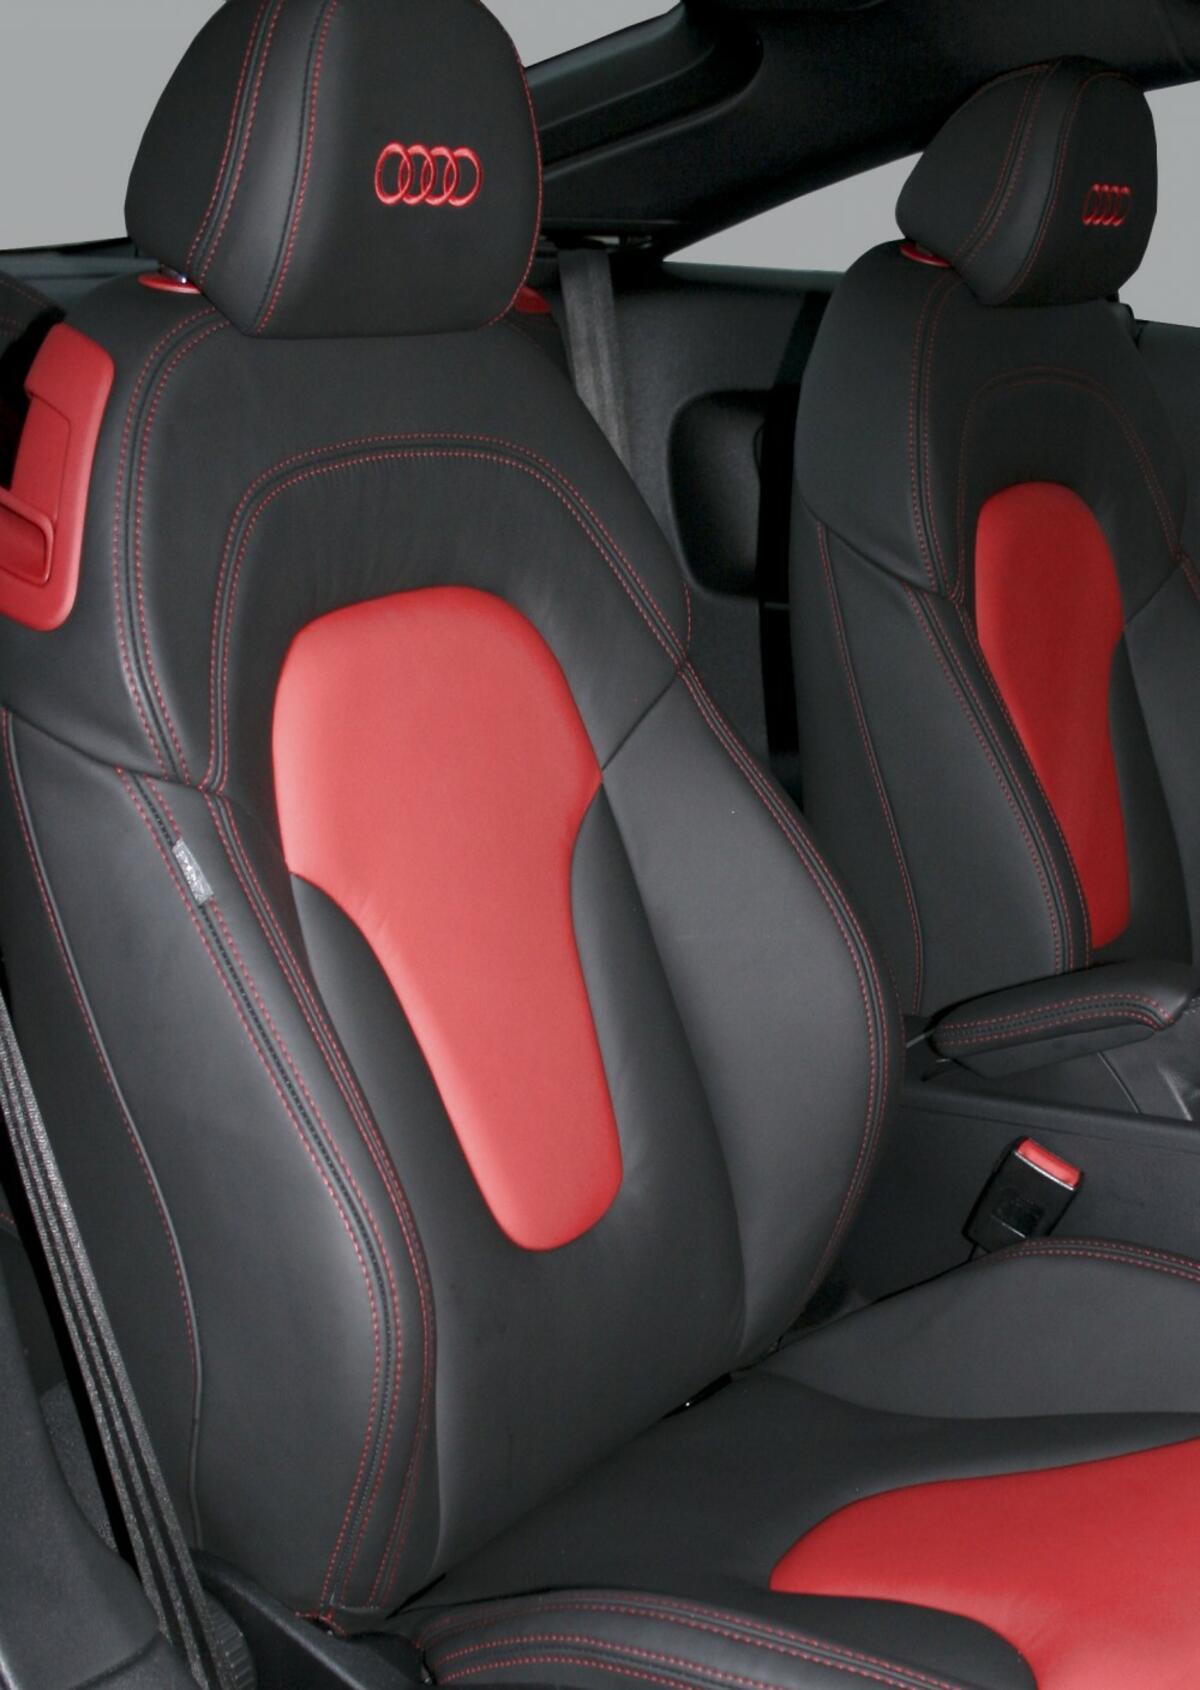 Home Furniture Diy Mtc Motorsport Audi Tt S3 Seat Leon Cupra 210 225 Silicone Coolant Hose Kit Red Kisetsu System Co Jp